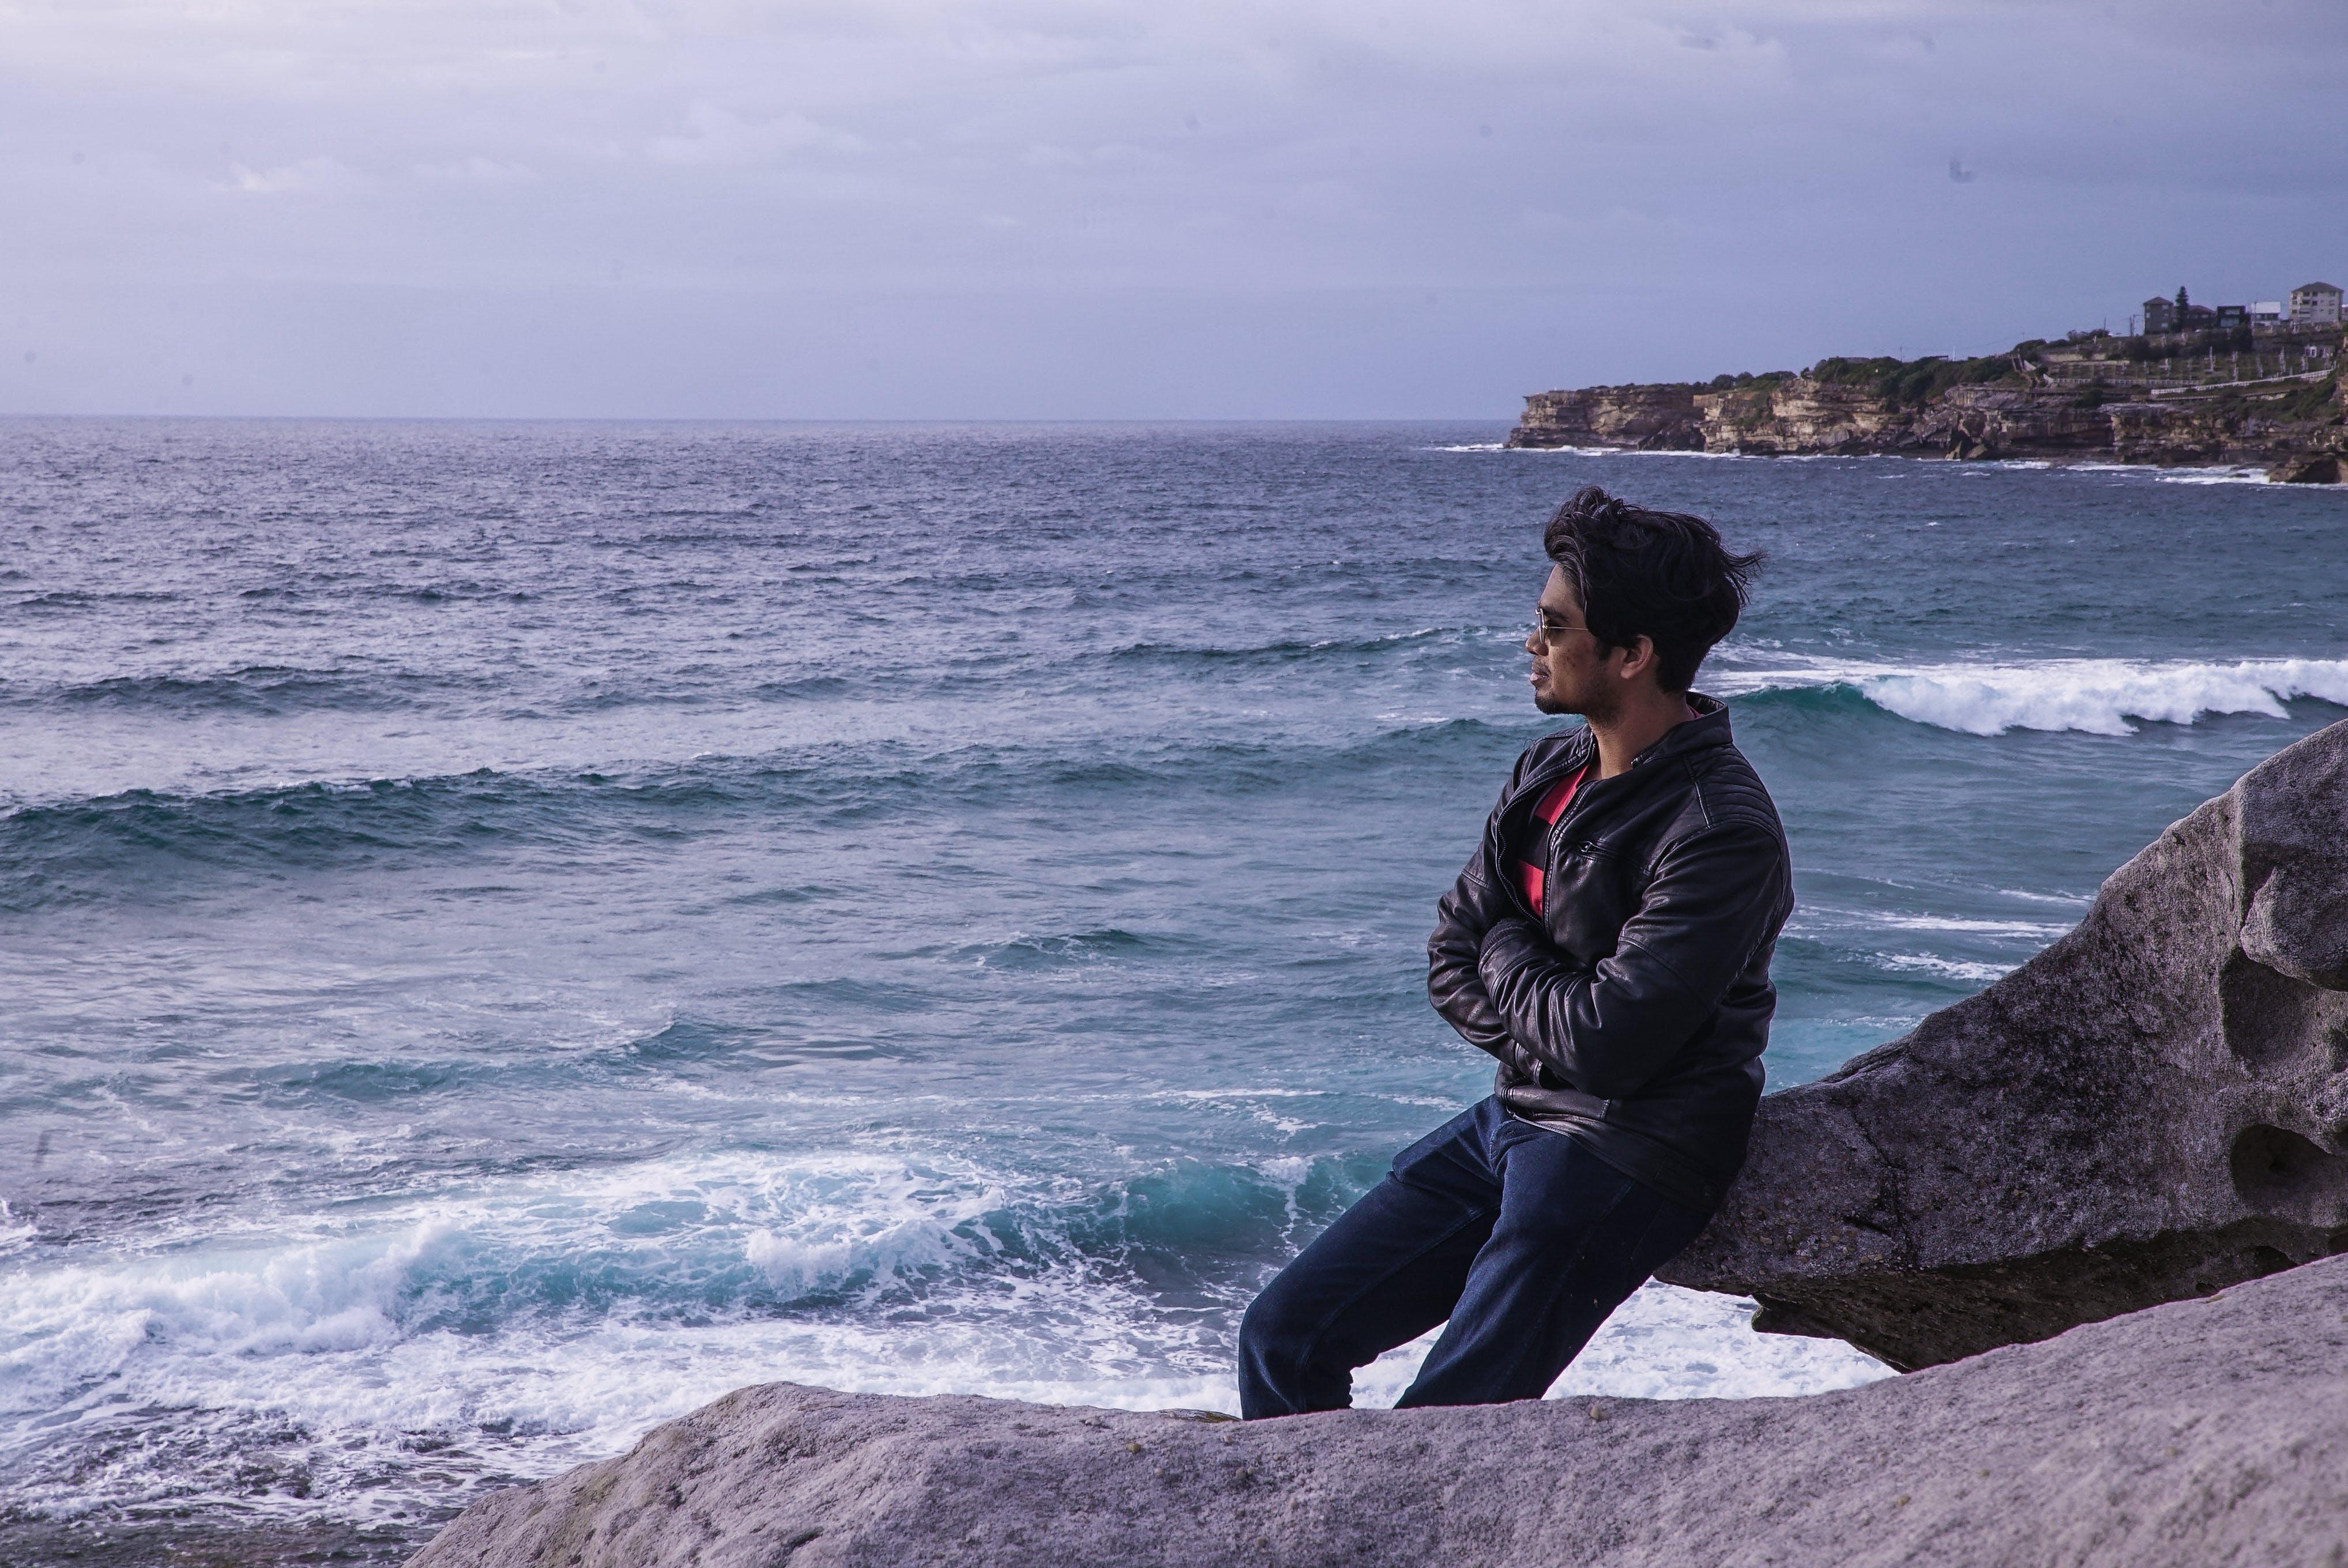 Man Leaning on Rock Near Beach Shore